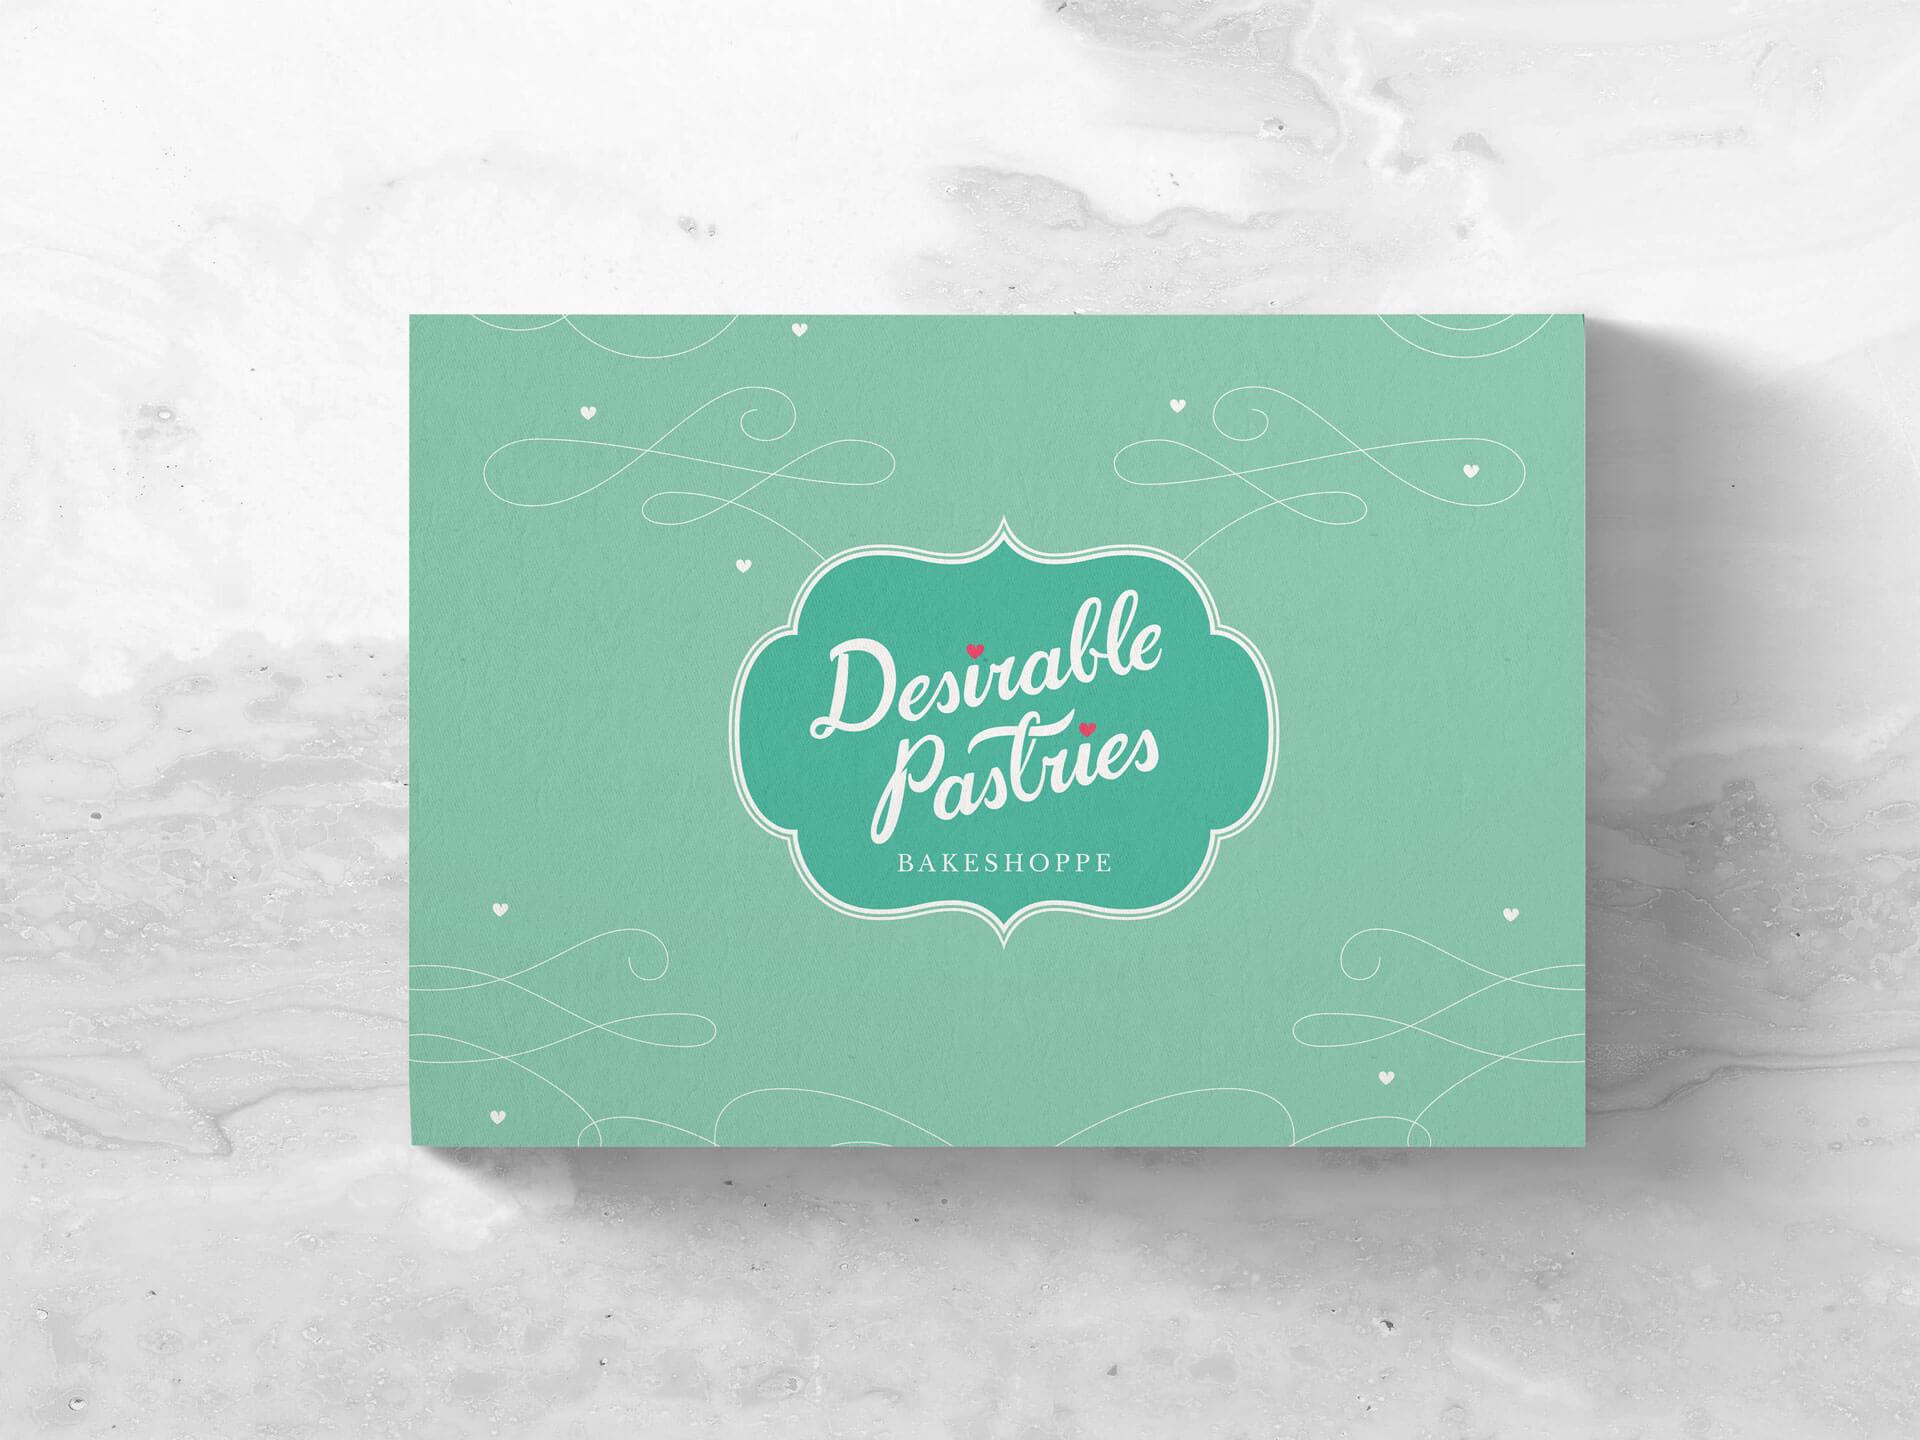 Desirable Pastries logo